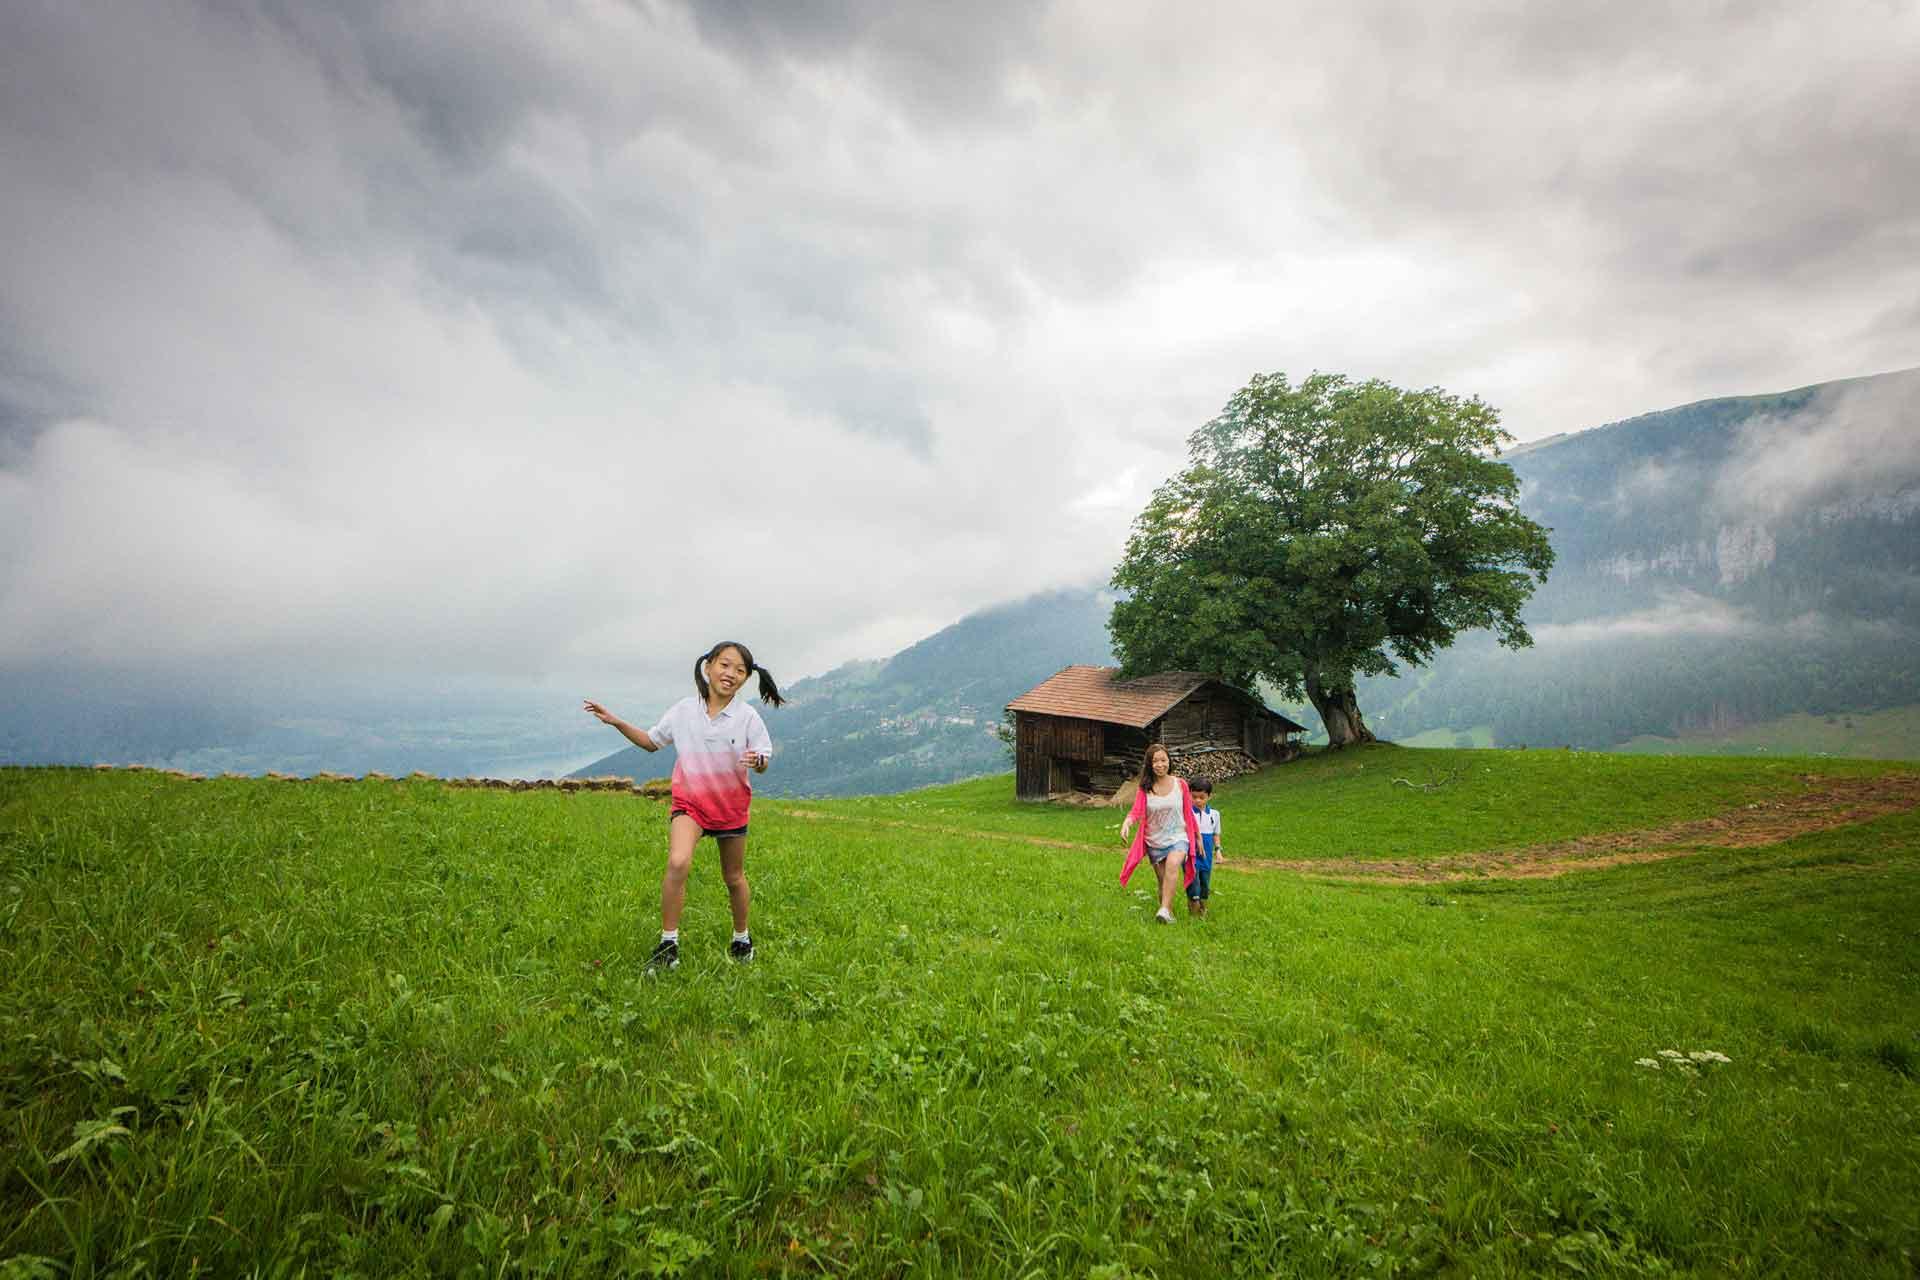 Family photo shoot photographer in Interlaken